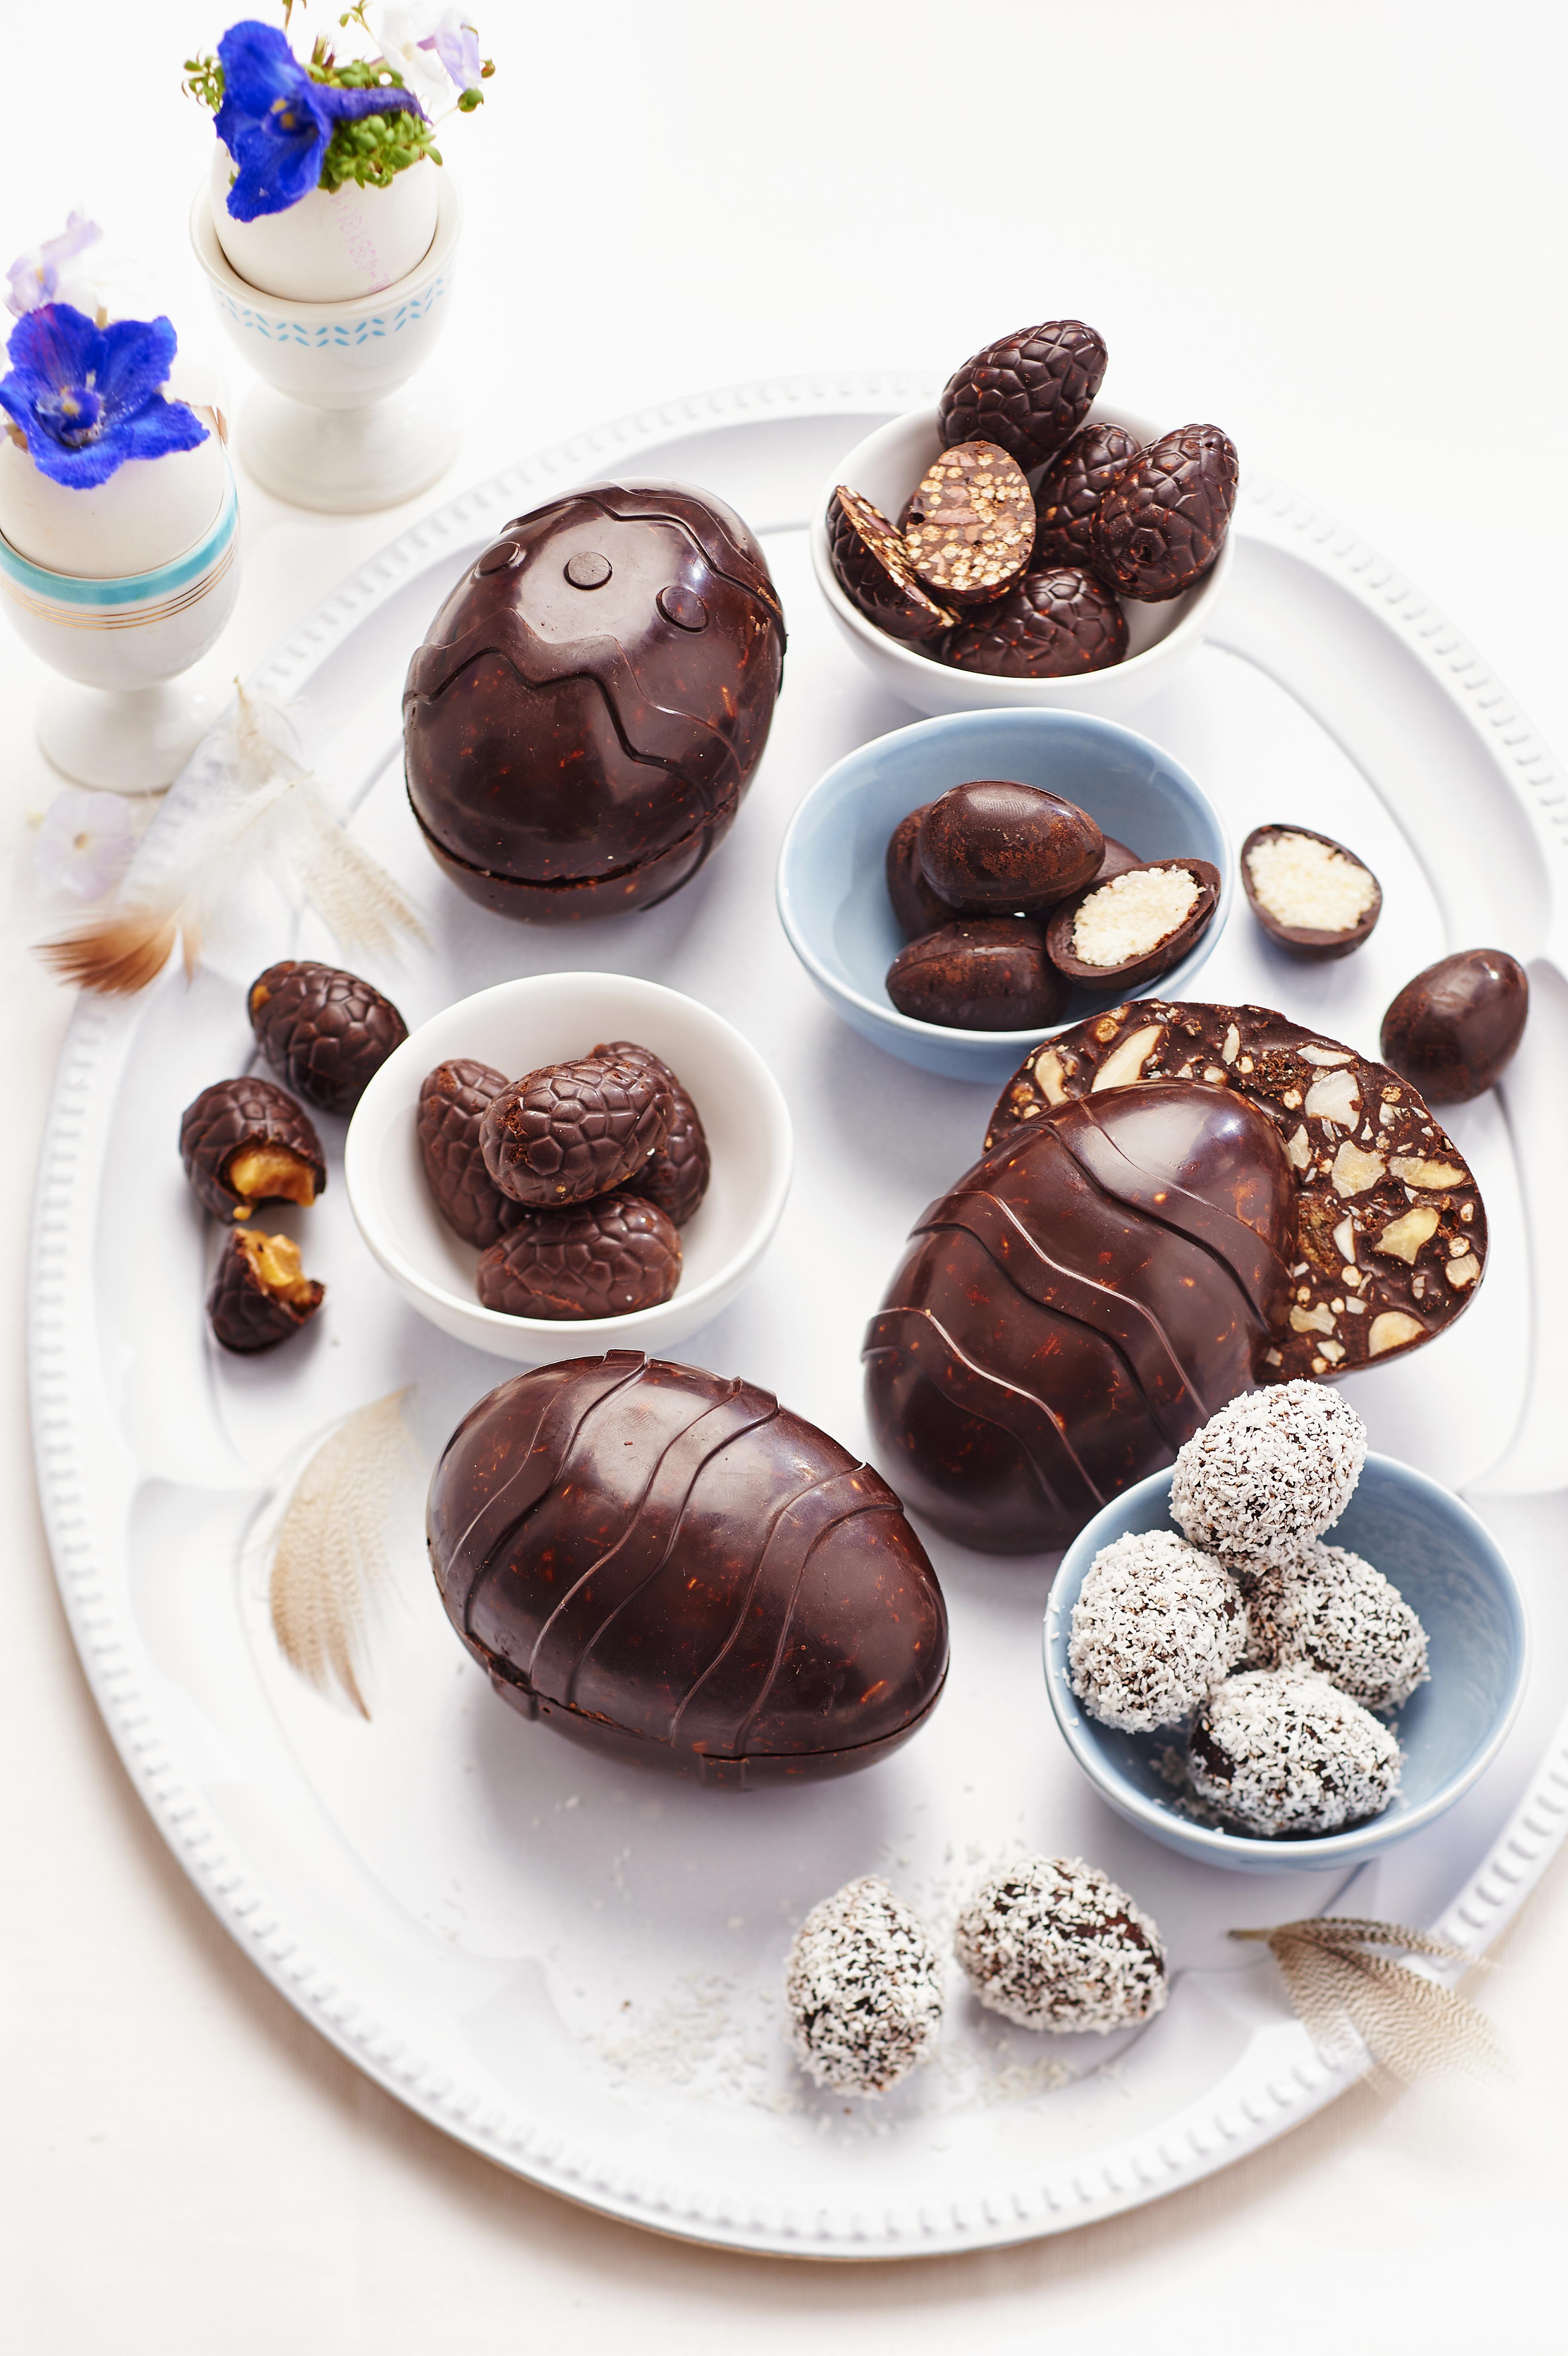 Amber_Feestrecepten_20150908-Paas_chocolade-Sfeerbeeld_p77-02